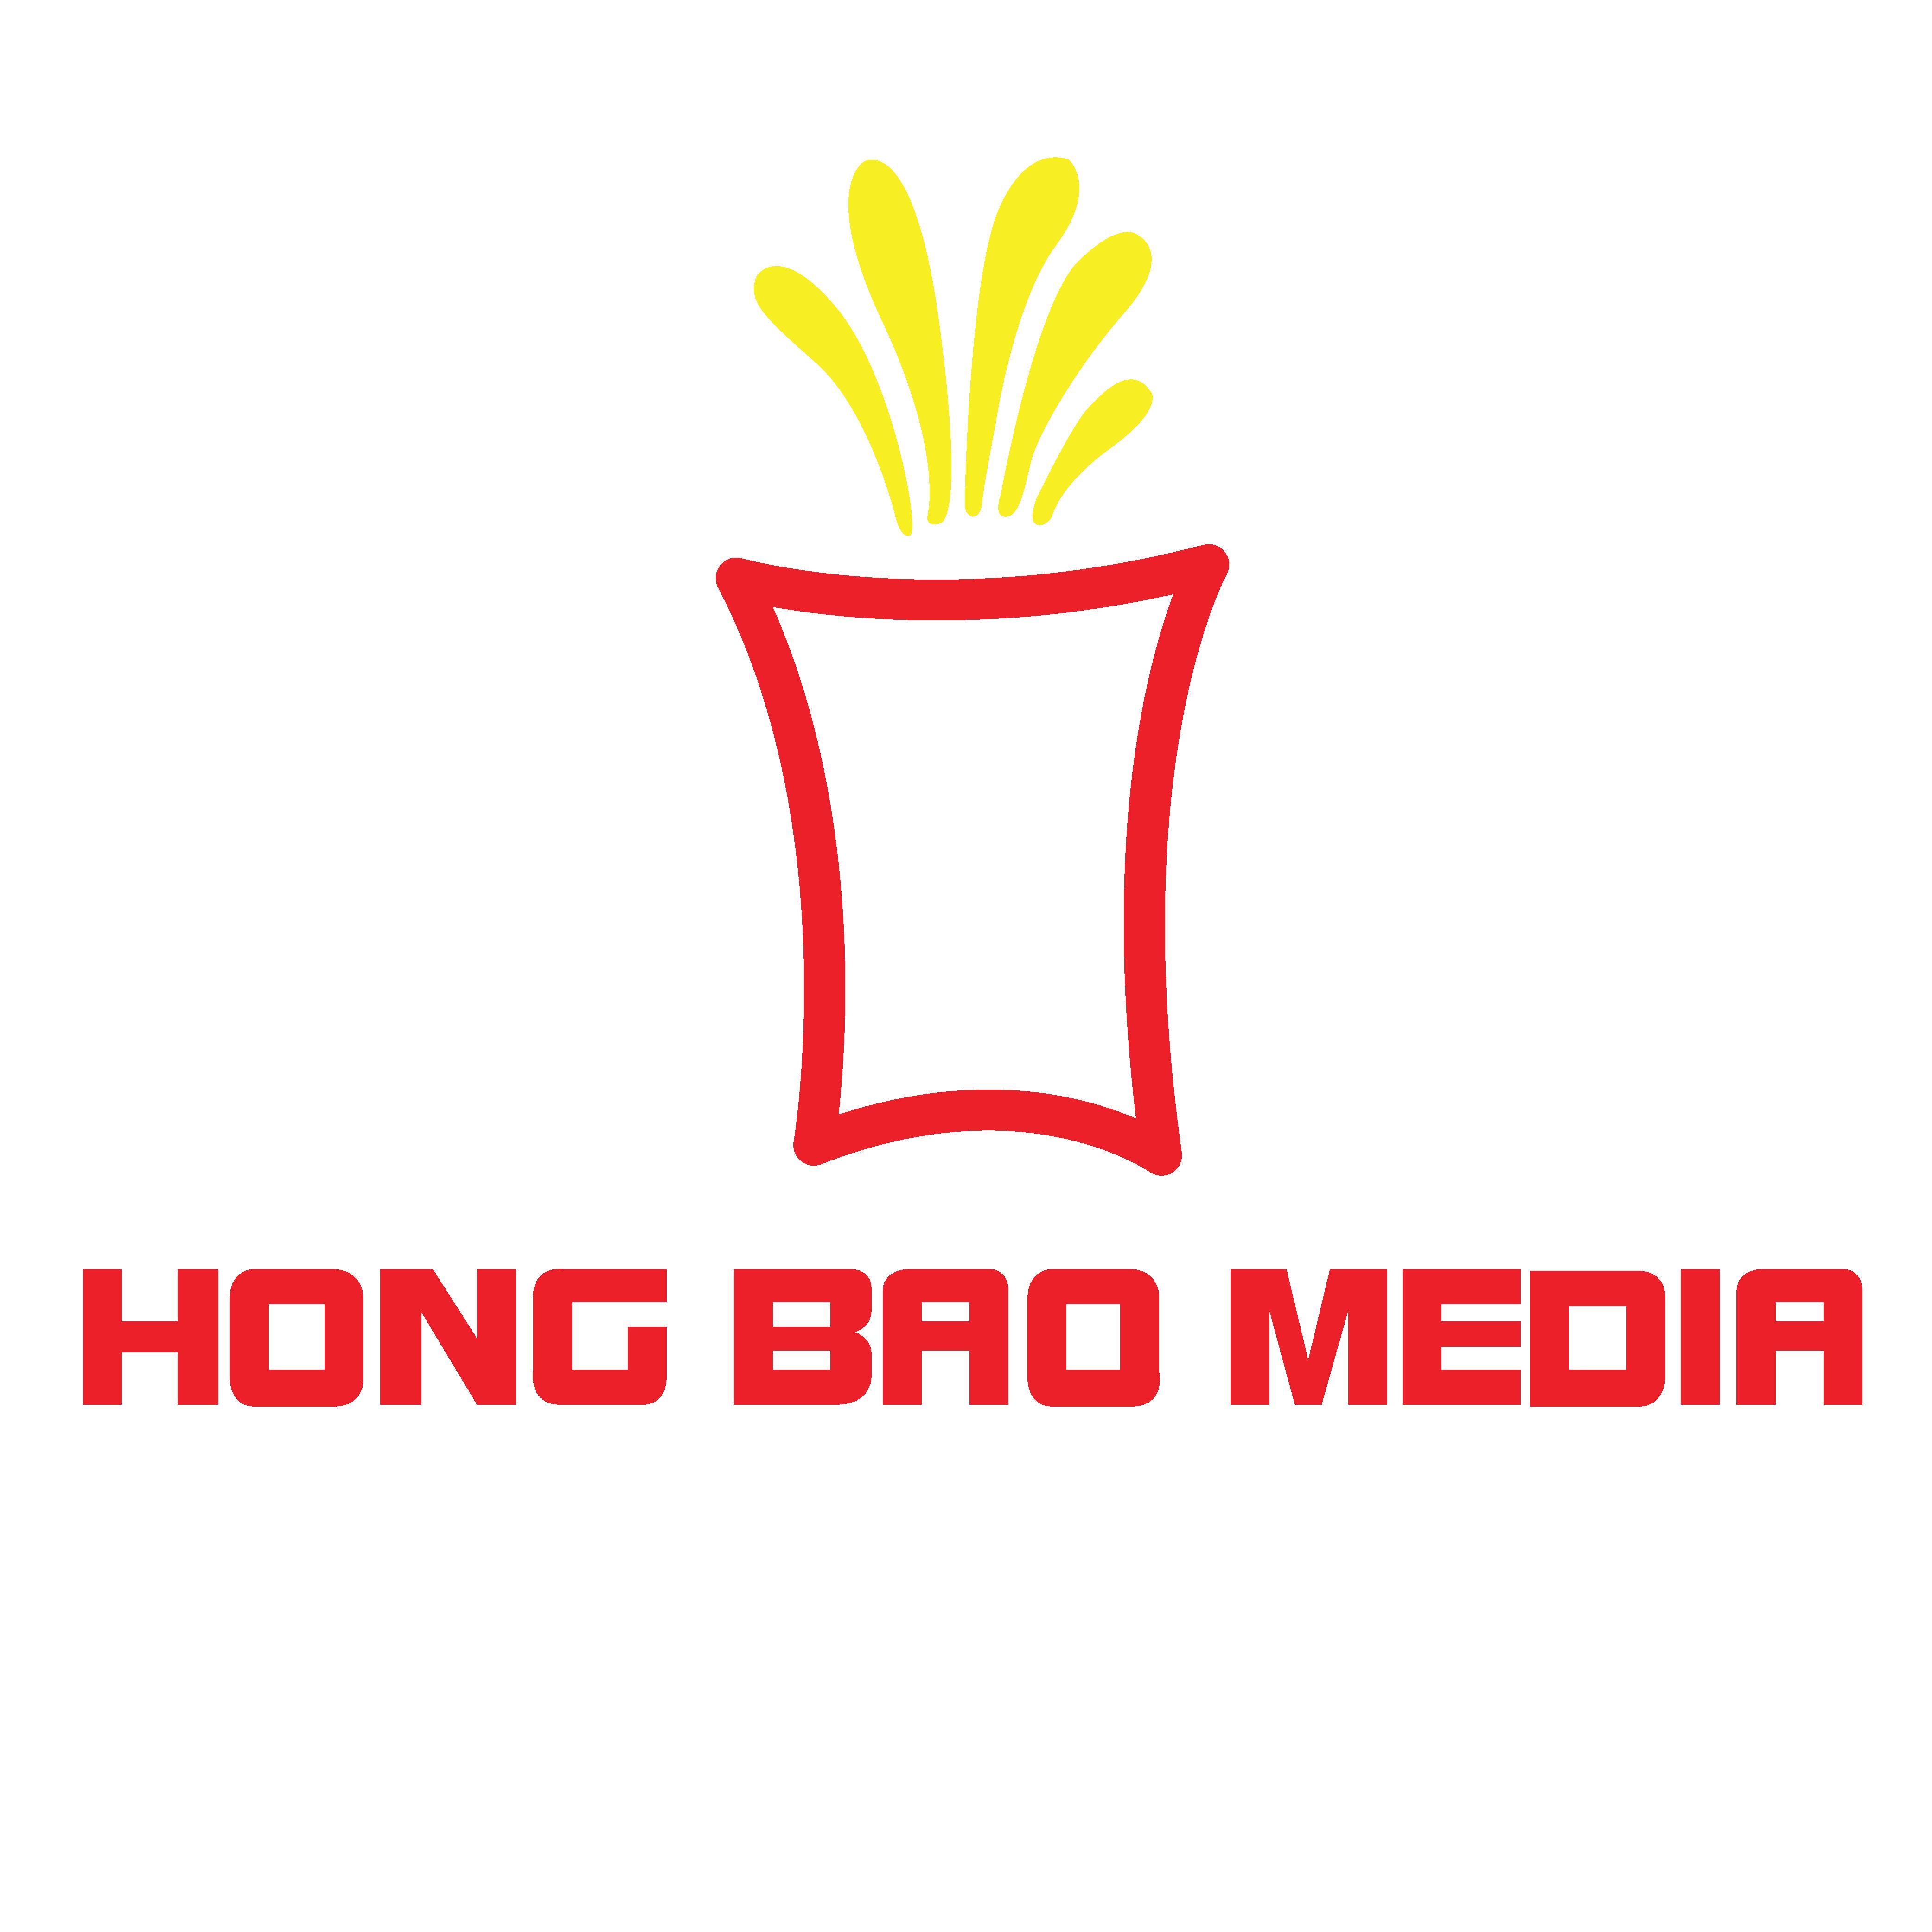 HONG BAO MEDIA